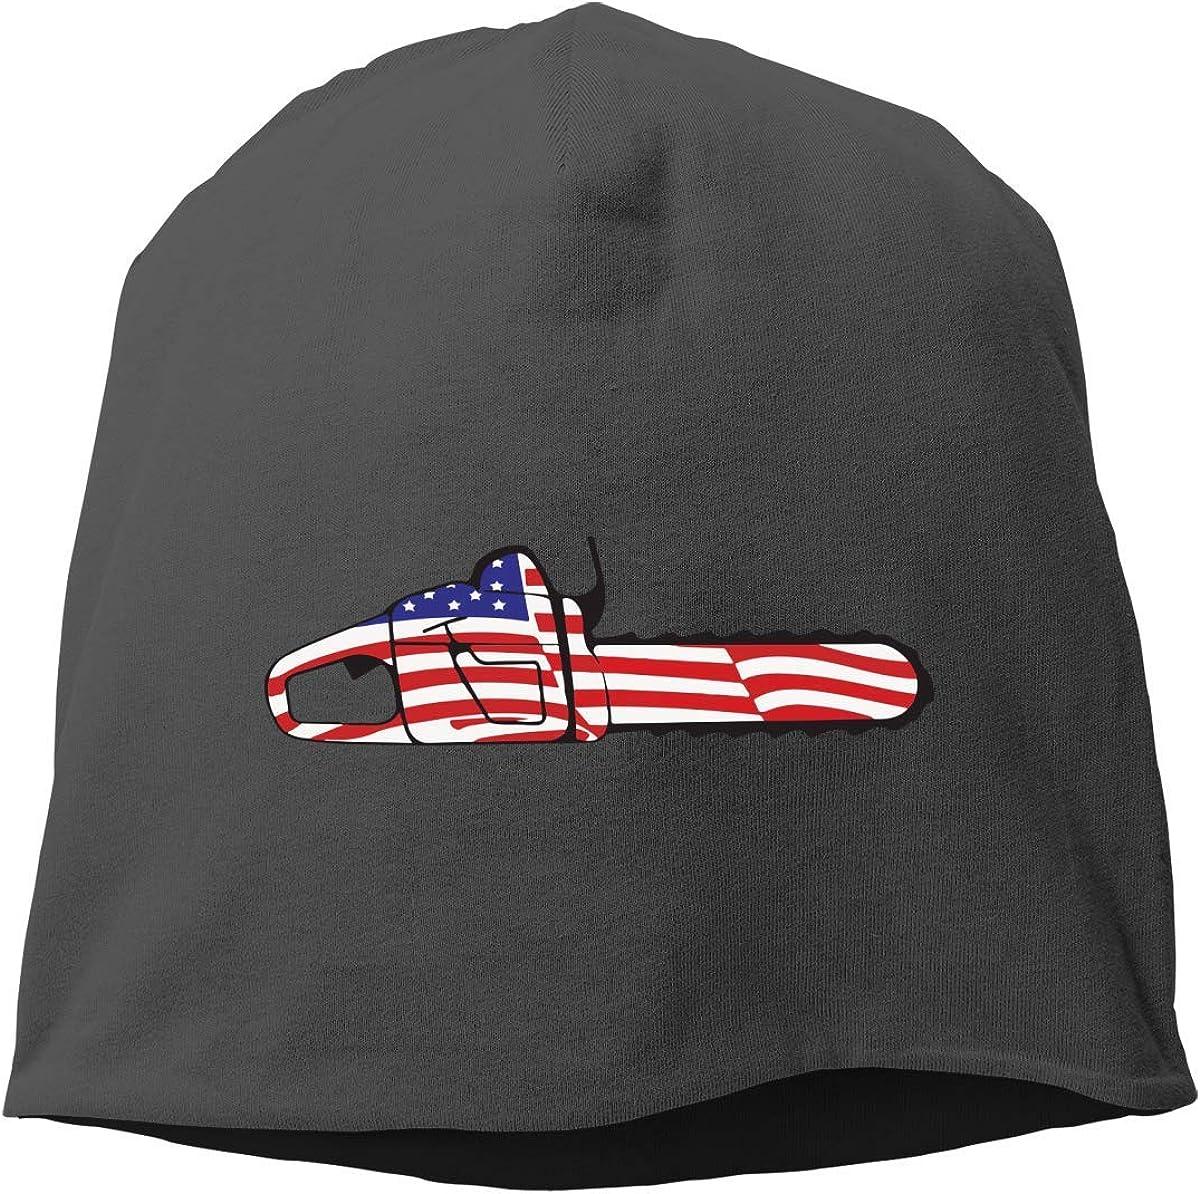 Lady Funny Day - Gorra unisex para motosierra, diseño de bandera estadounidense